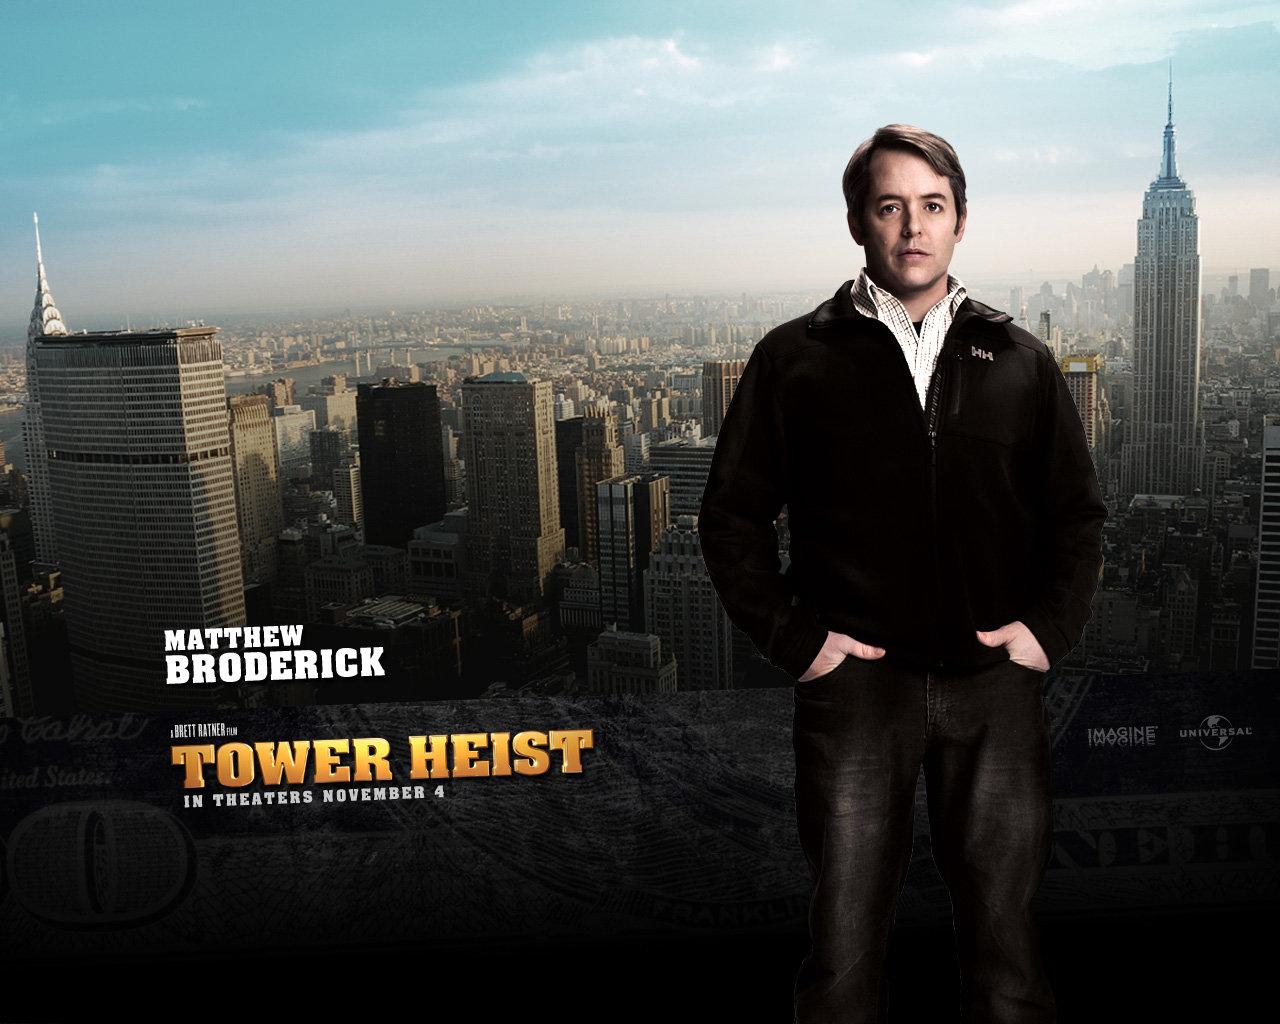 http://1.bp.blogspot.com/-NwJ5YRAEEDs/TwvWfajOzvI/AAAAAAAAEUk/VWMZkow17XY/s1600/Tower-Heist-Wallpaper-06.jpg